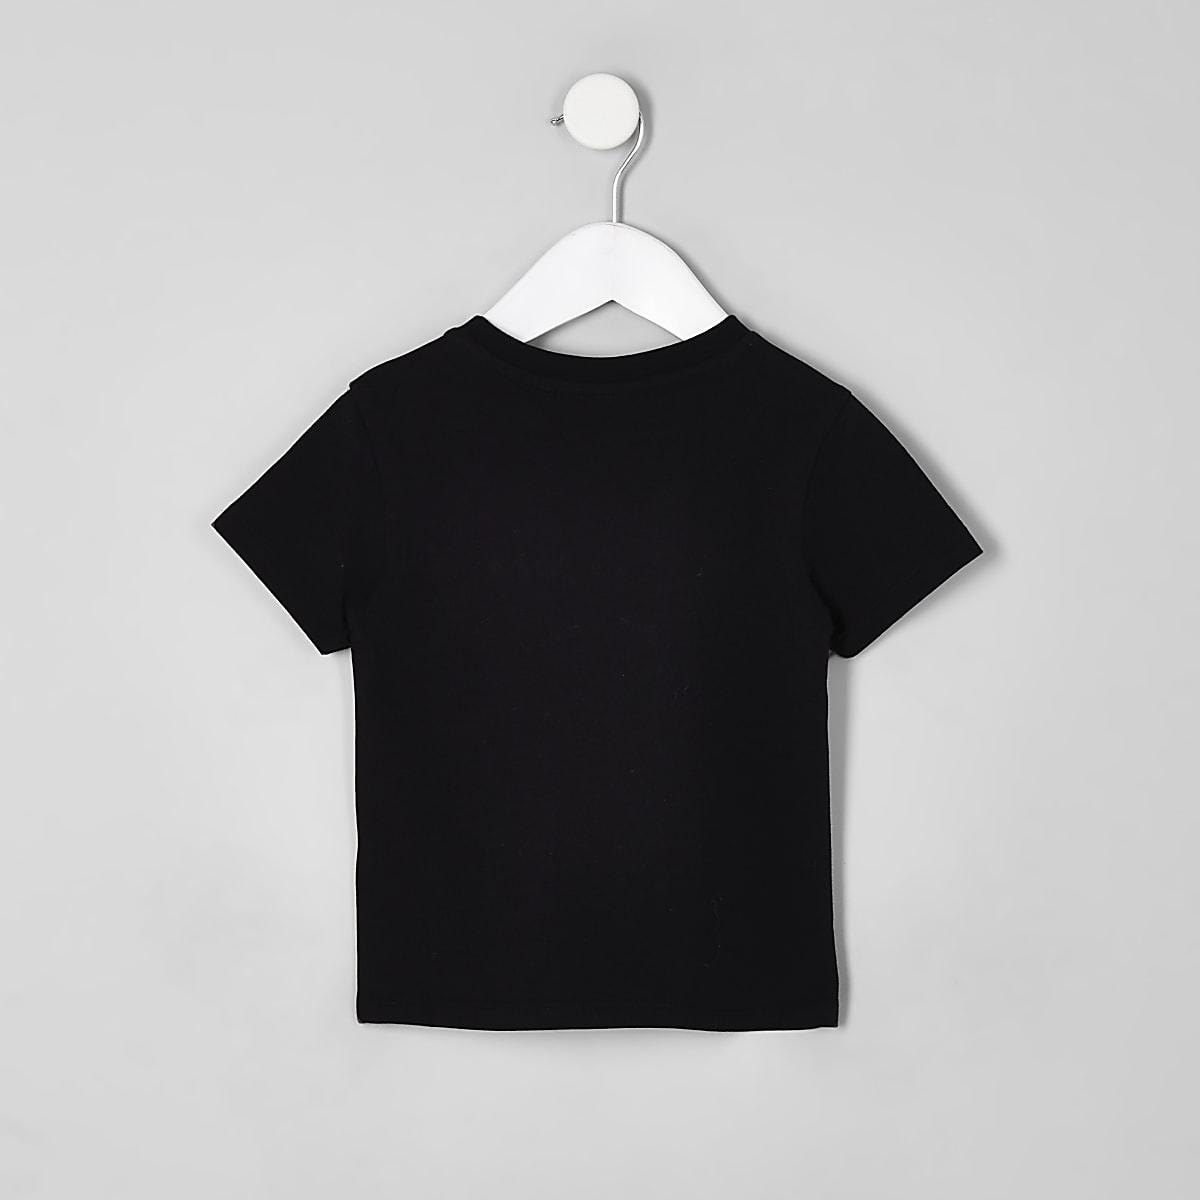 c85a6bfc Mini boys black Biggie Smalls T-shirt - Baby Boys Tops - Mini Boys ...